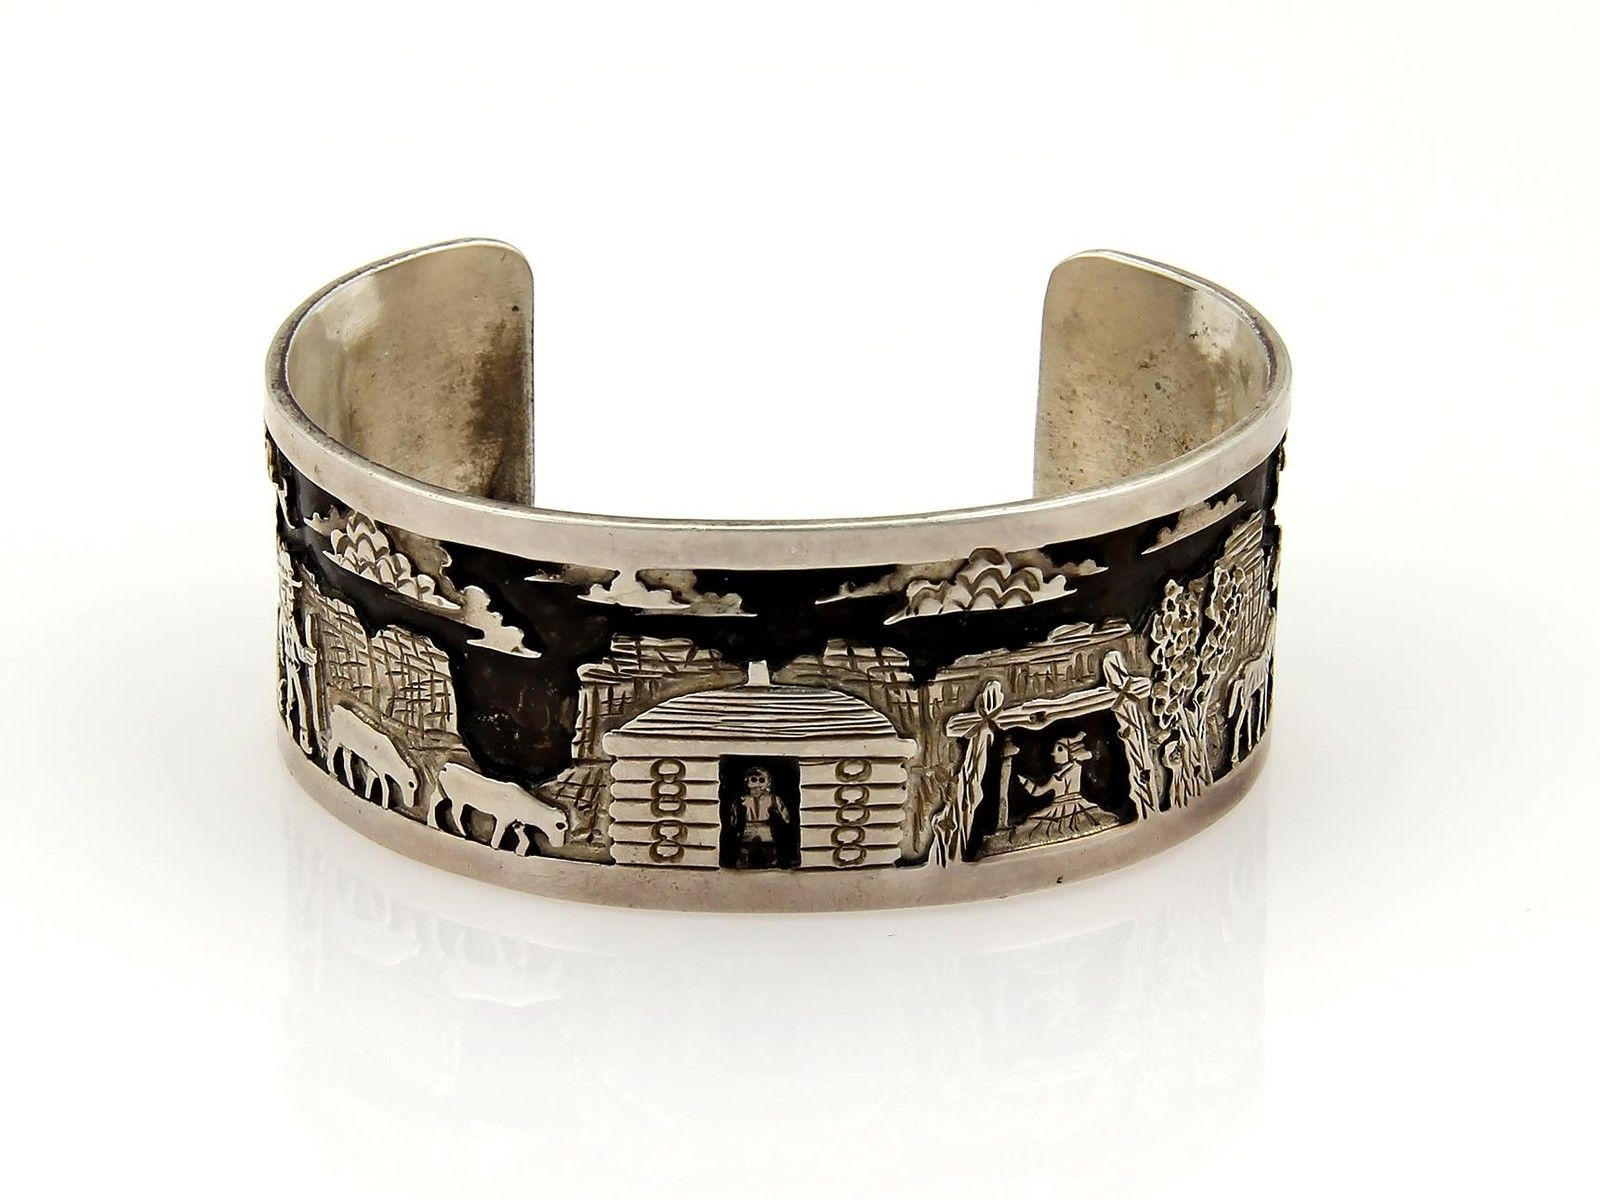 """""Native Indian CH Sterling Silver Carved Village Scene Cuff Bracelet"""""" 199723"